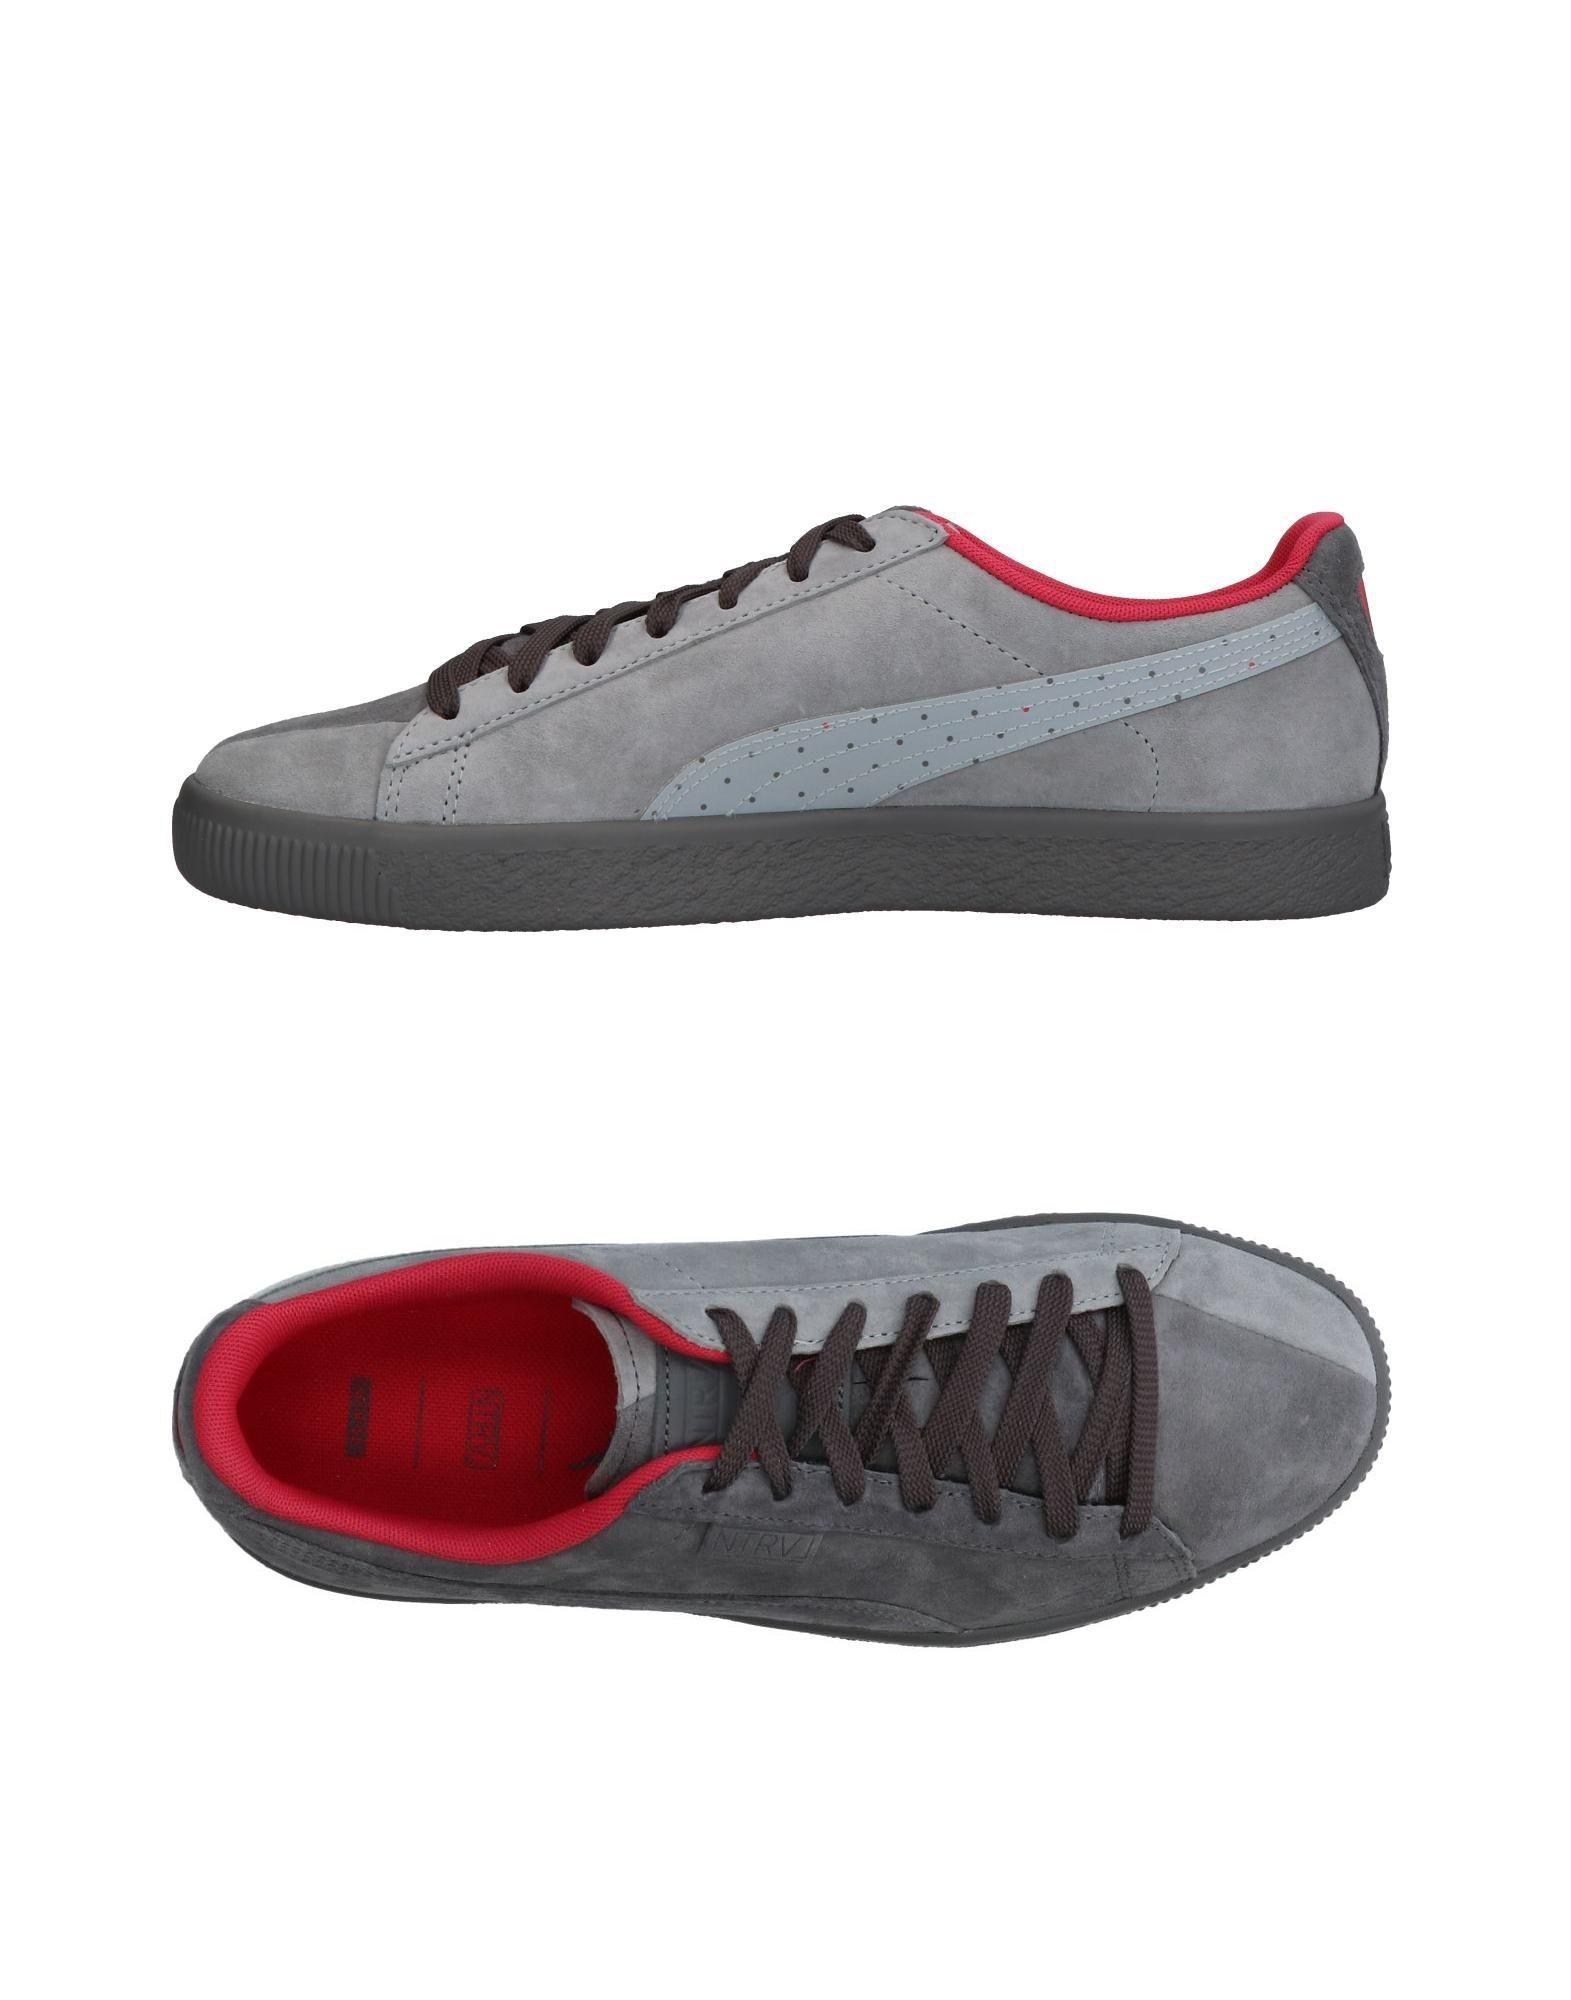 11326527NE Puma Sneakers Herren  11326527NE  Heiße Schuhe a29d02